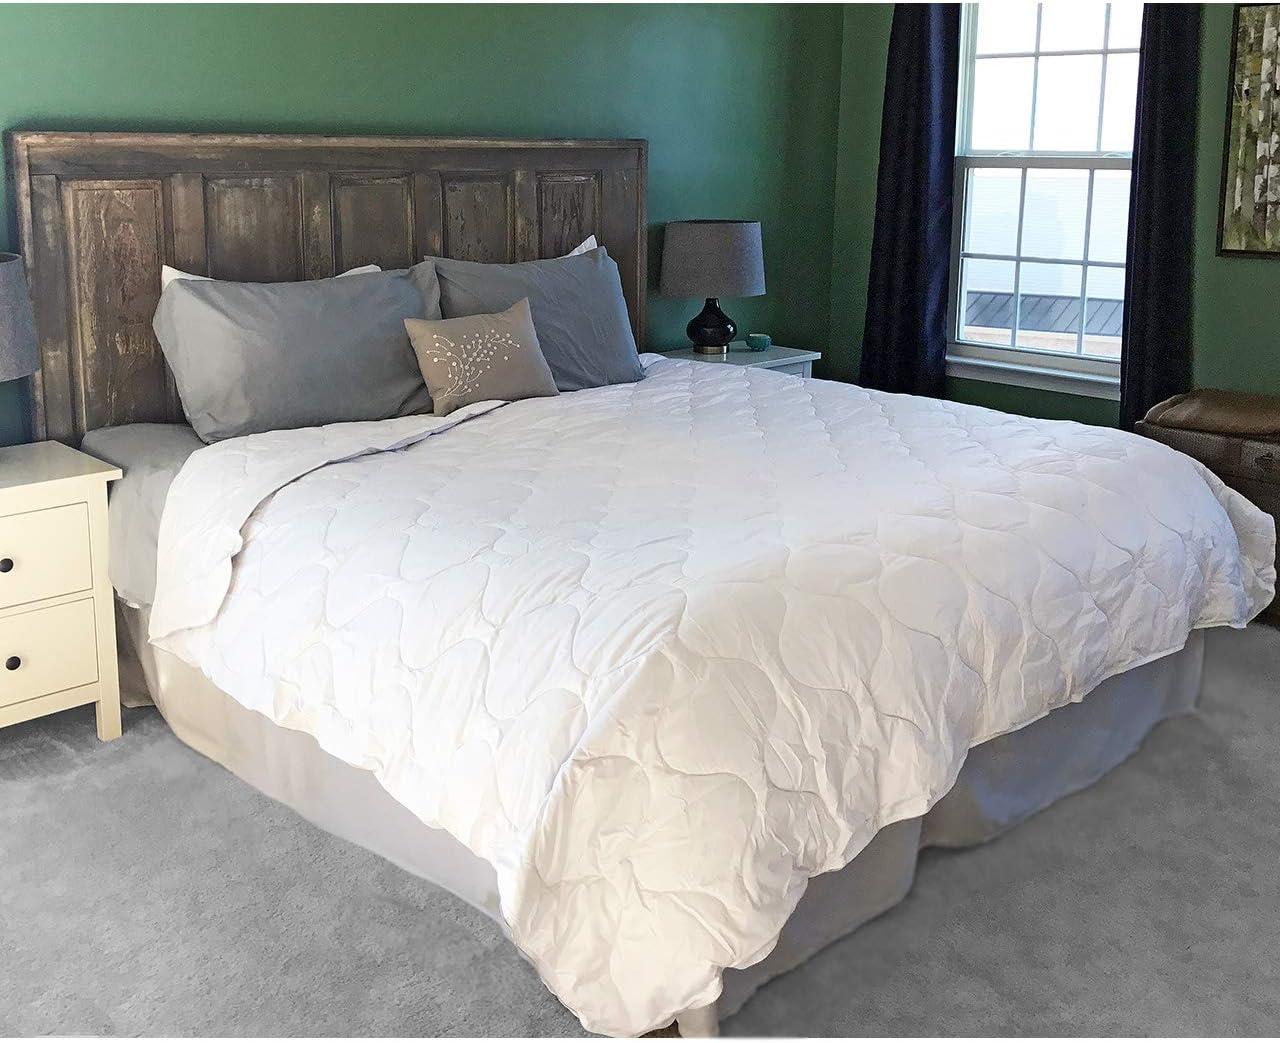 Alpaca Duvet - Hypoallergenic Comforter / Down Alternative - 100% Alpaca Wool Filling with 100% Pima Cotton Casing   Regular Weight ~ New (King/Cal King)